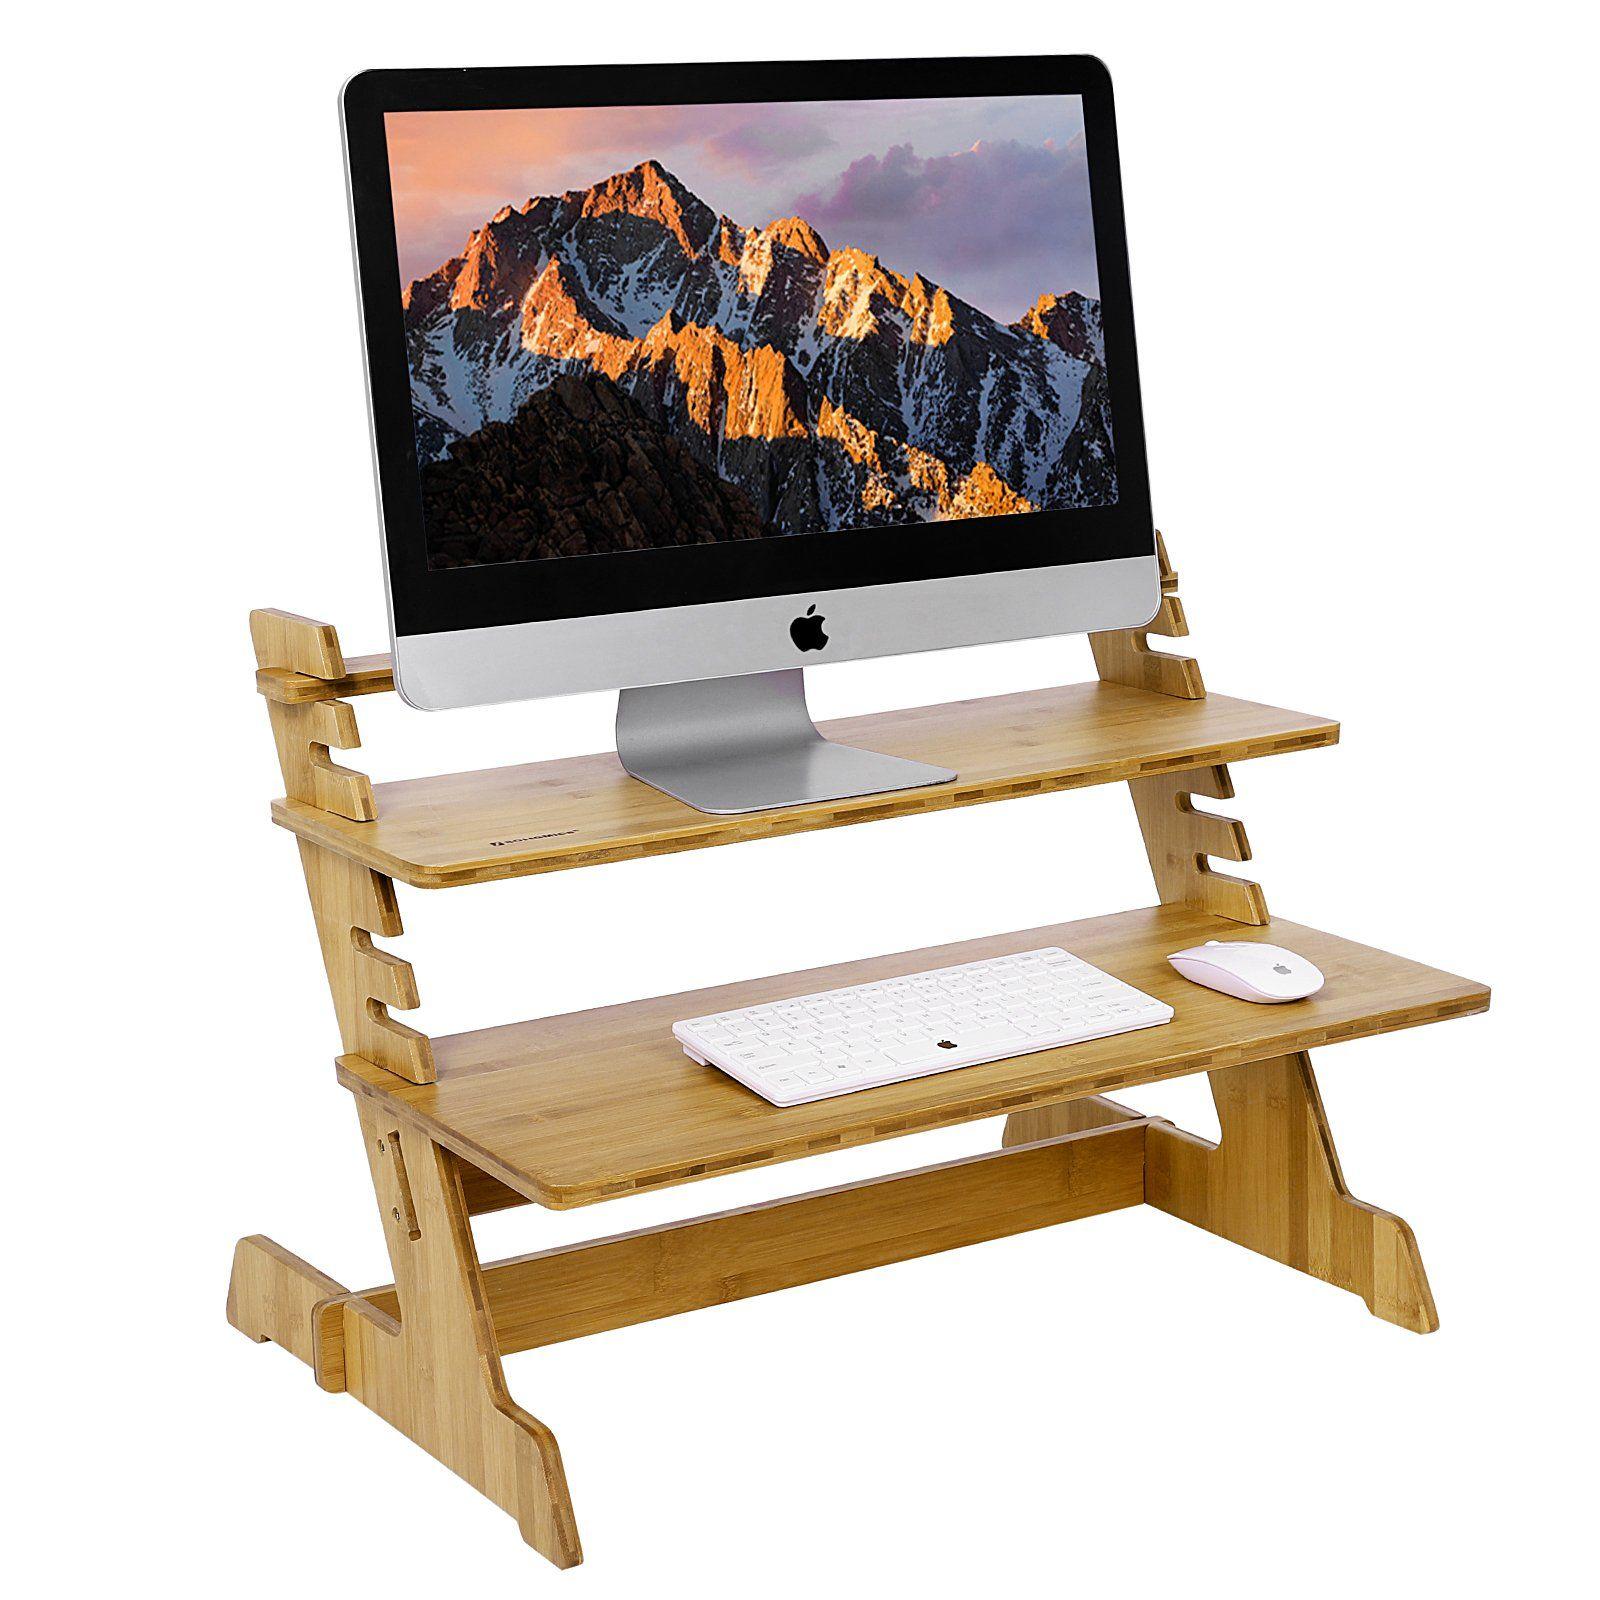 SONGMICS Bamboo Standing Computer Desk Monitor Stand Riser